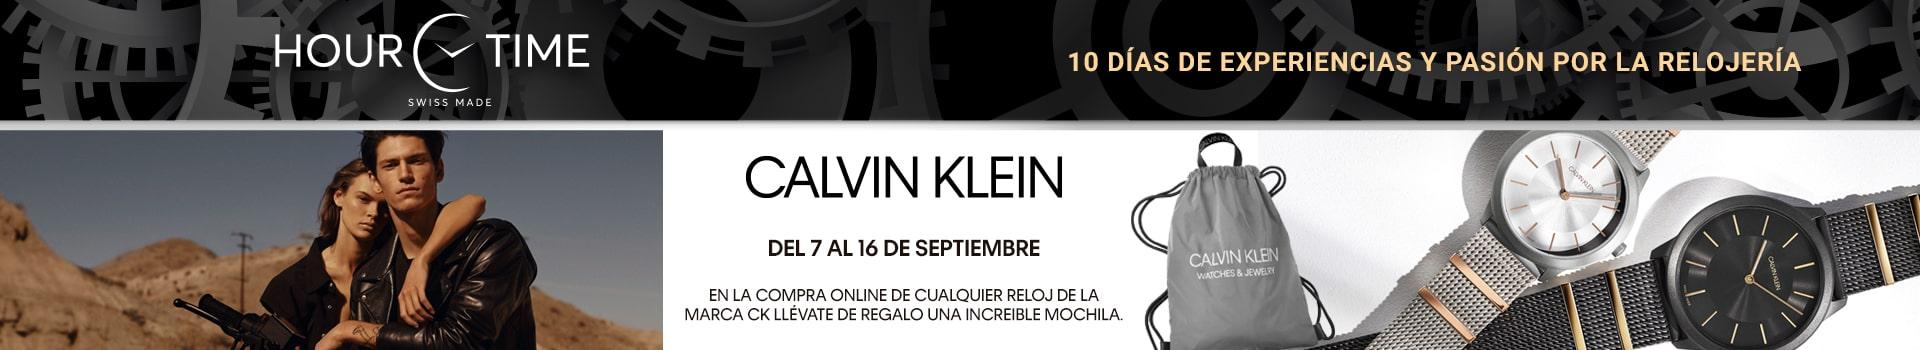 Calvin Klein relojes Cristal Joyas